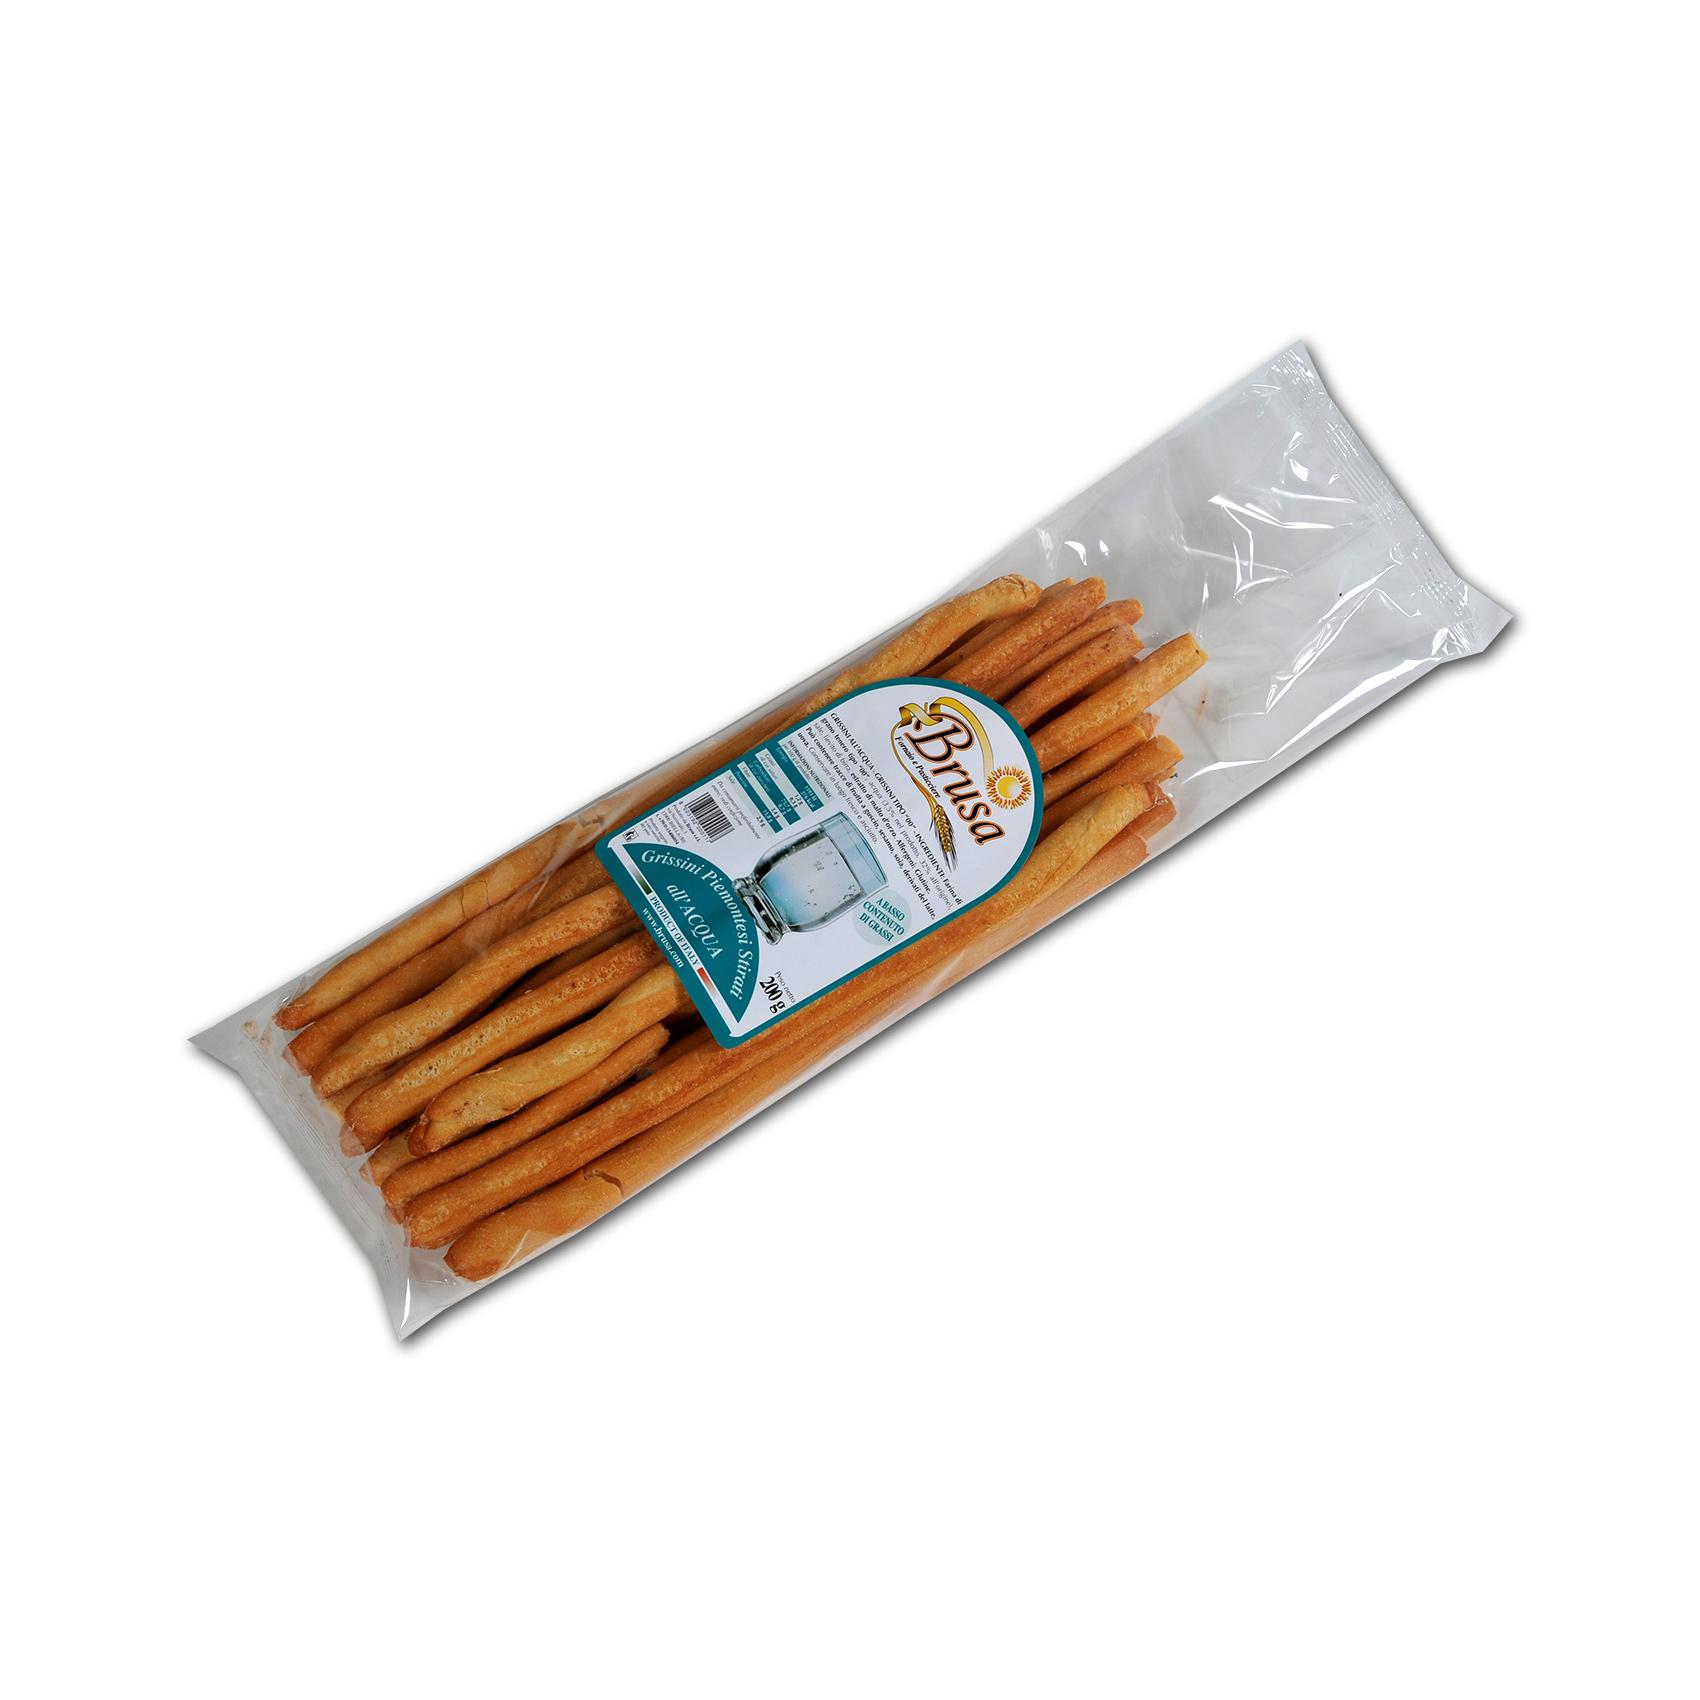 grissini-piemontesi皮埃蒙特清水面包条-200g